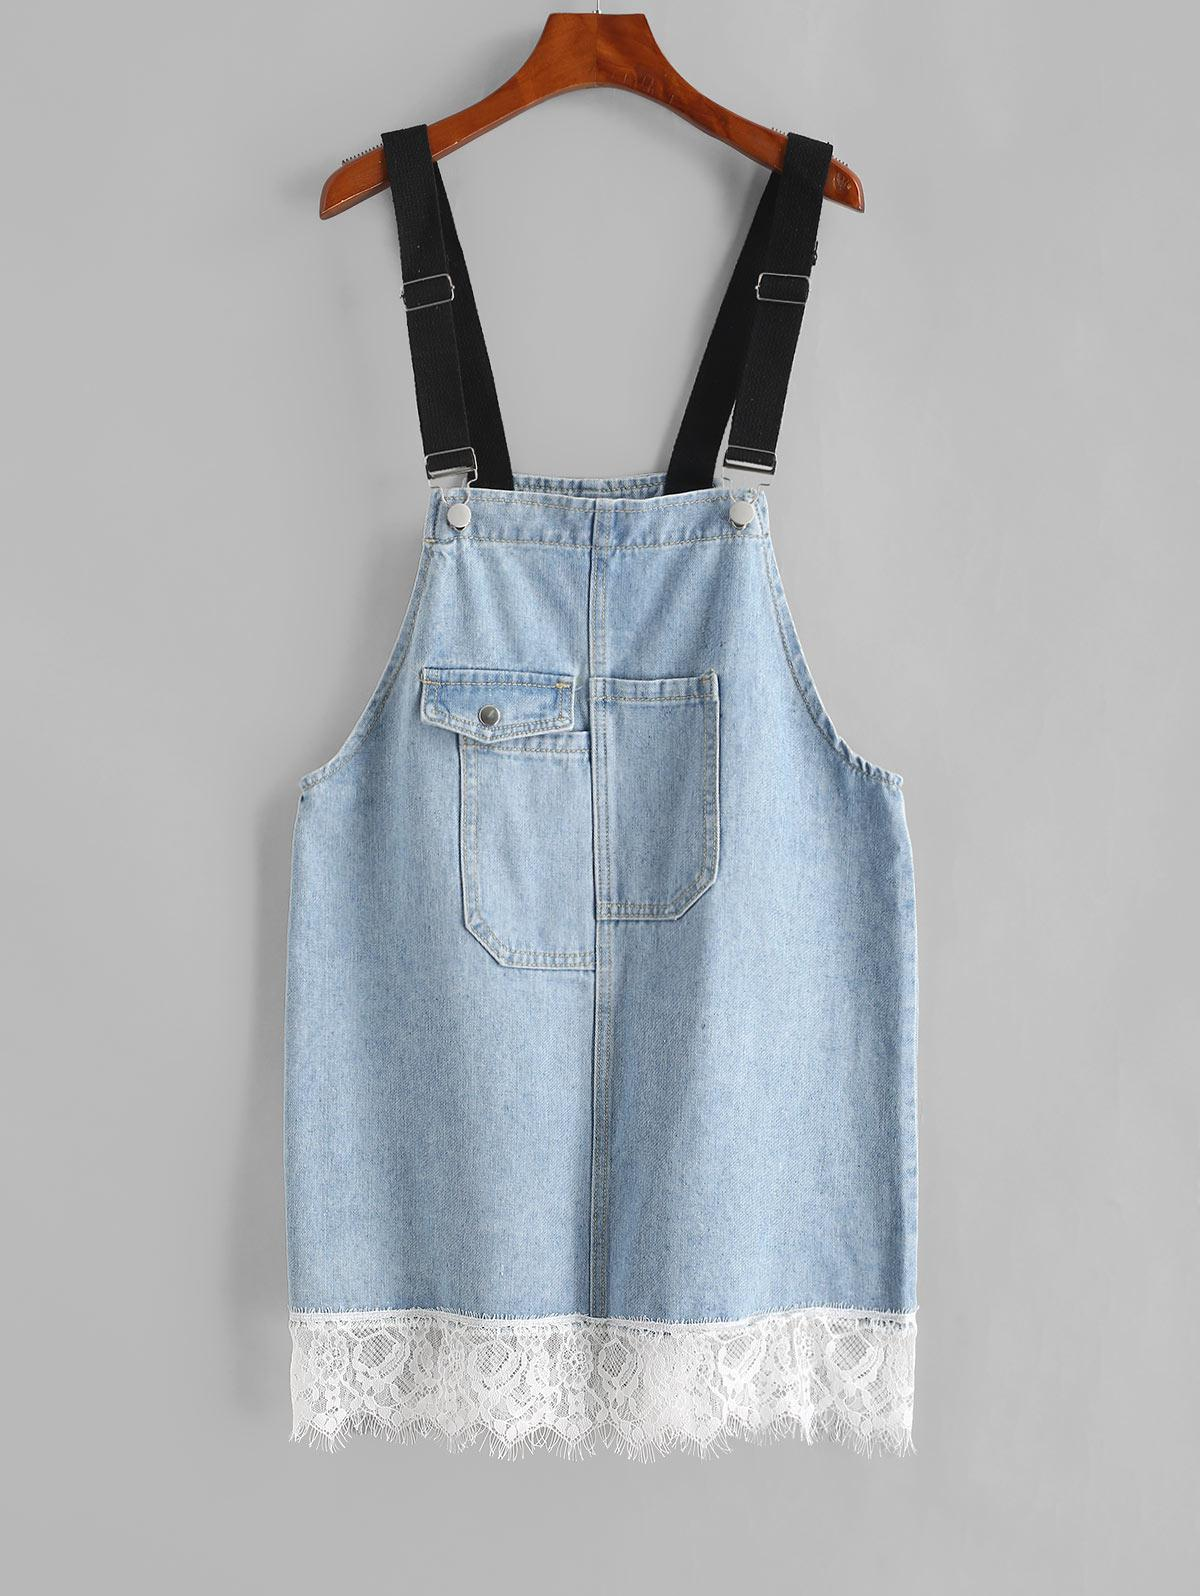 Flap Pocket Lace Trim Overall Jean Dress